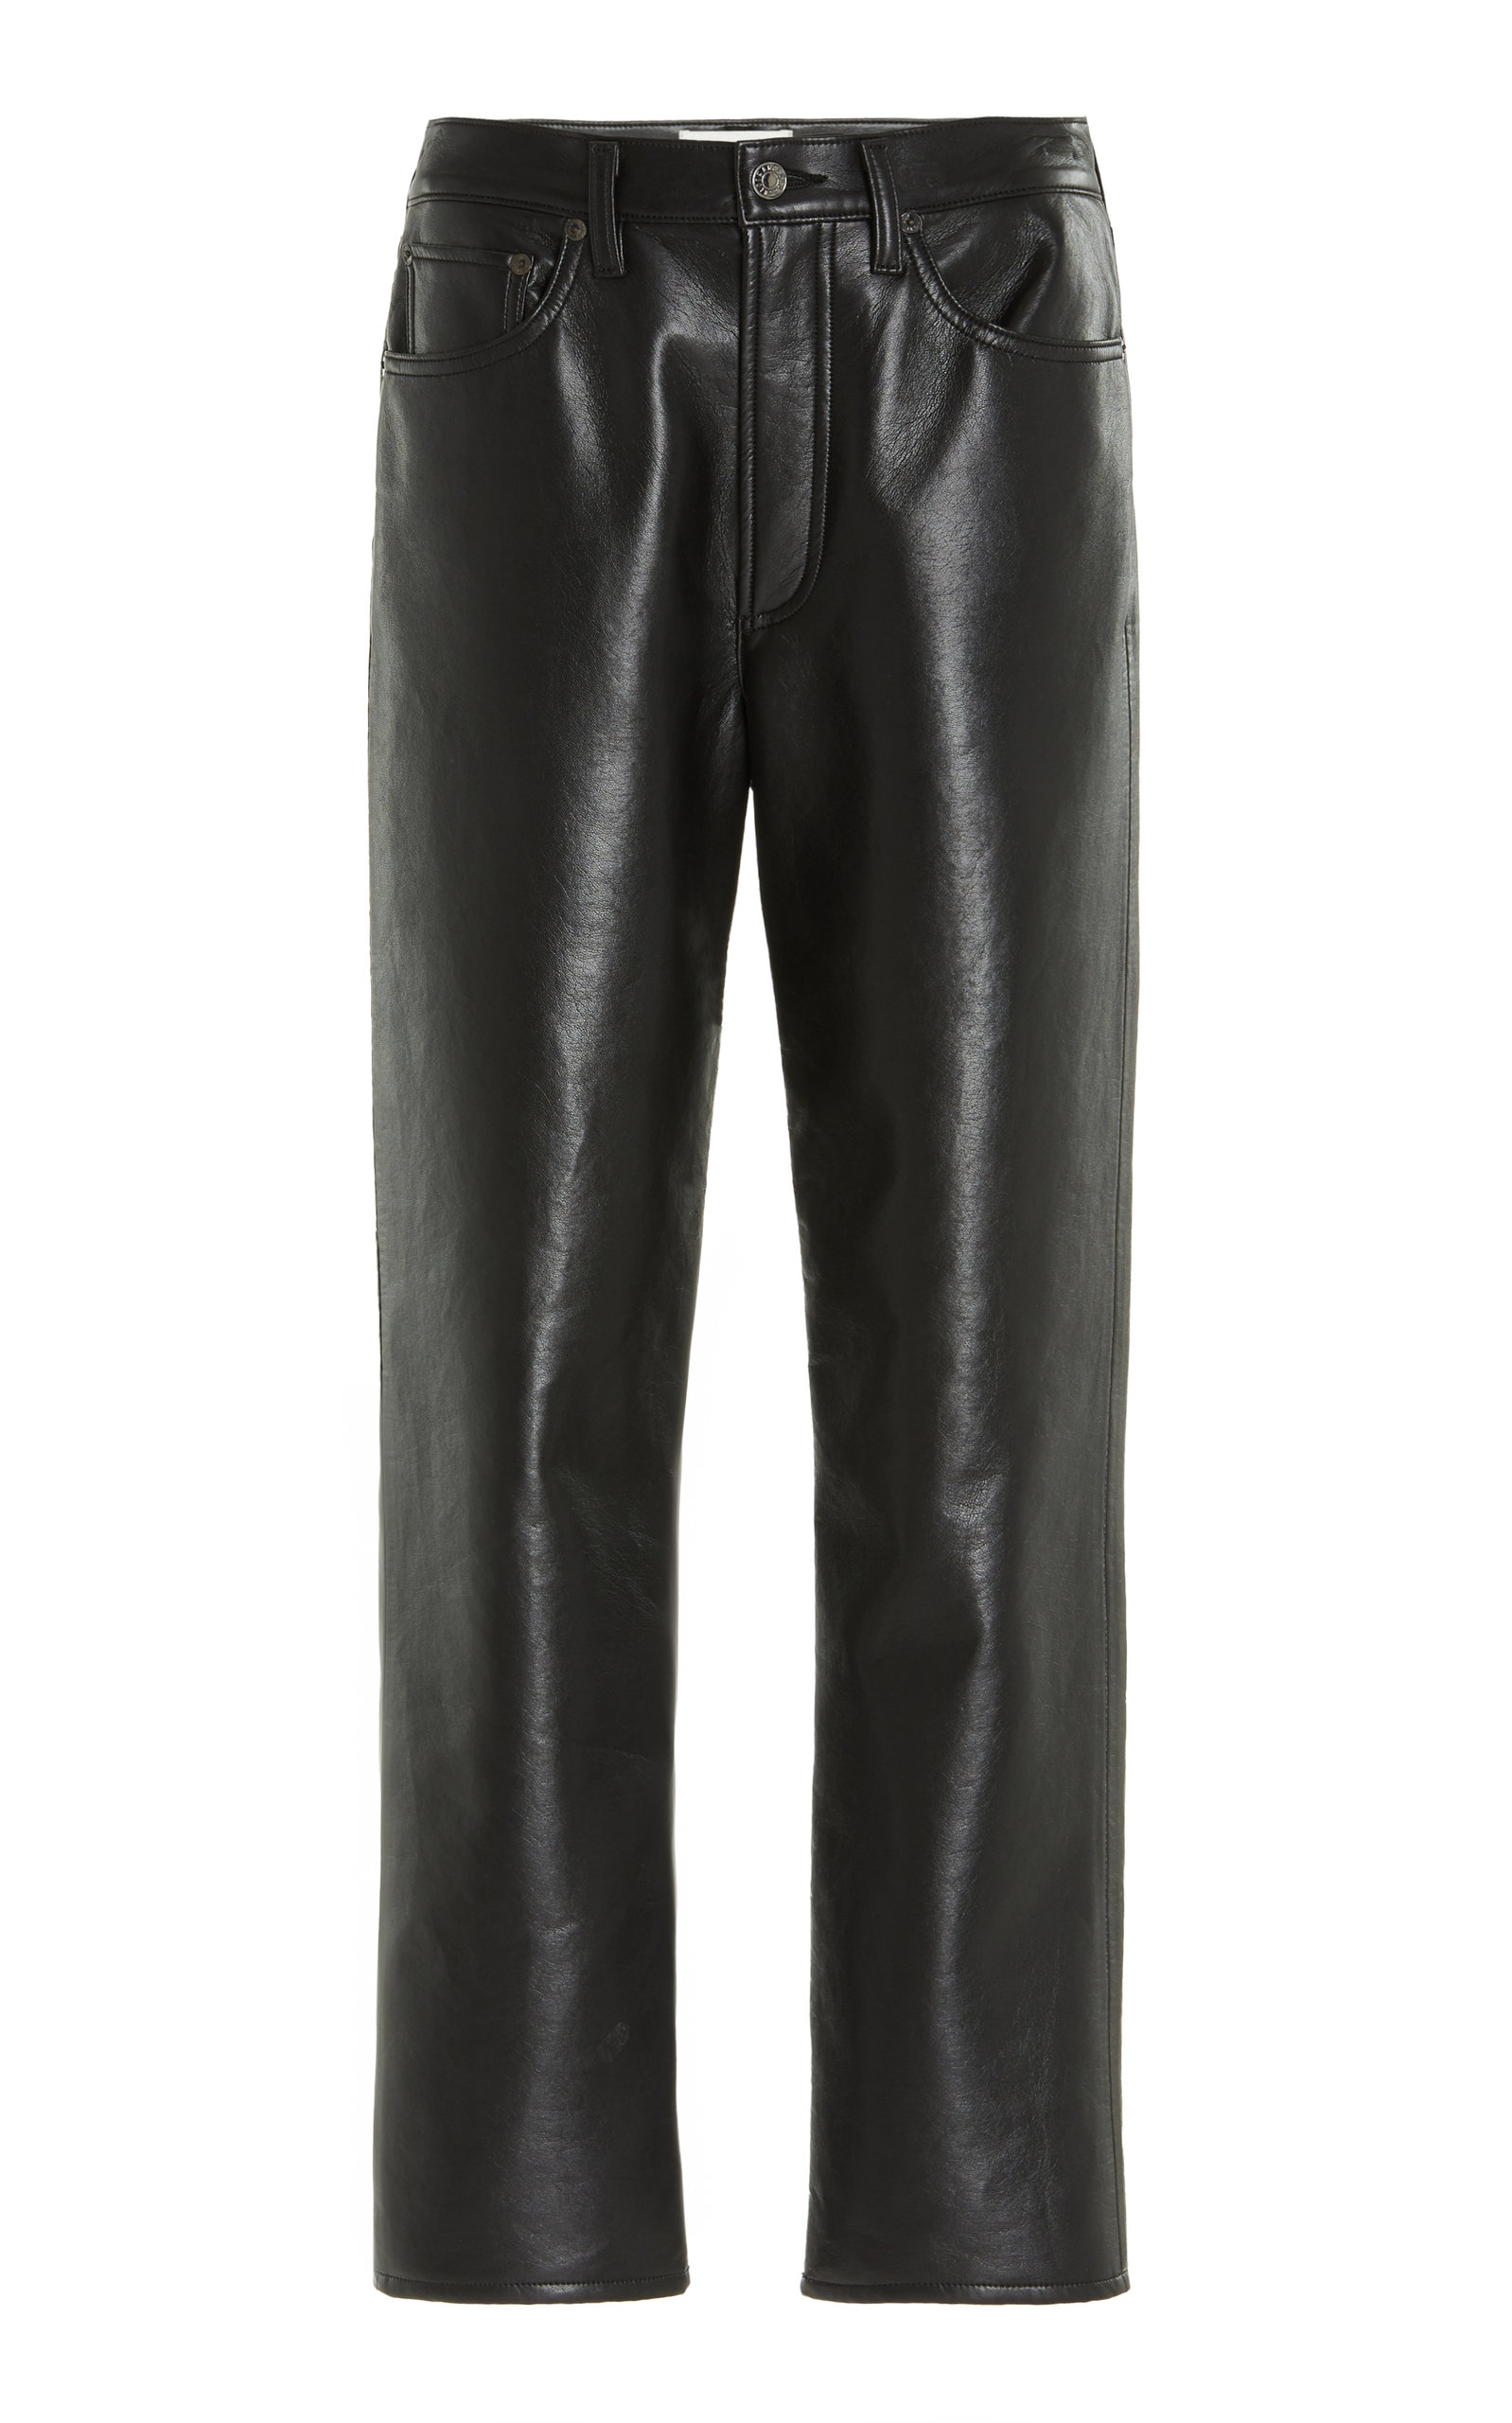 Agolde - Women's 90's High-Rise Recycled Leather Straight-Leg Pants - Black/green - Moda Operandi